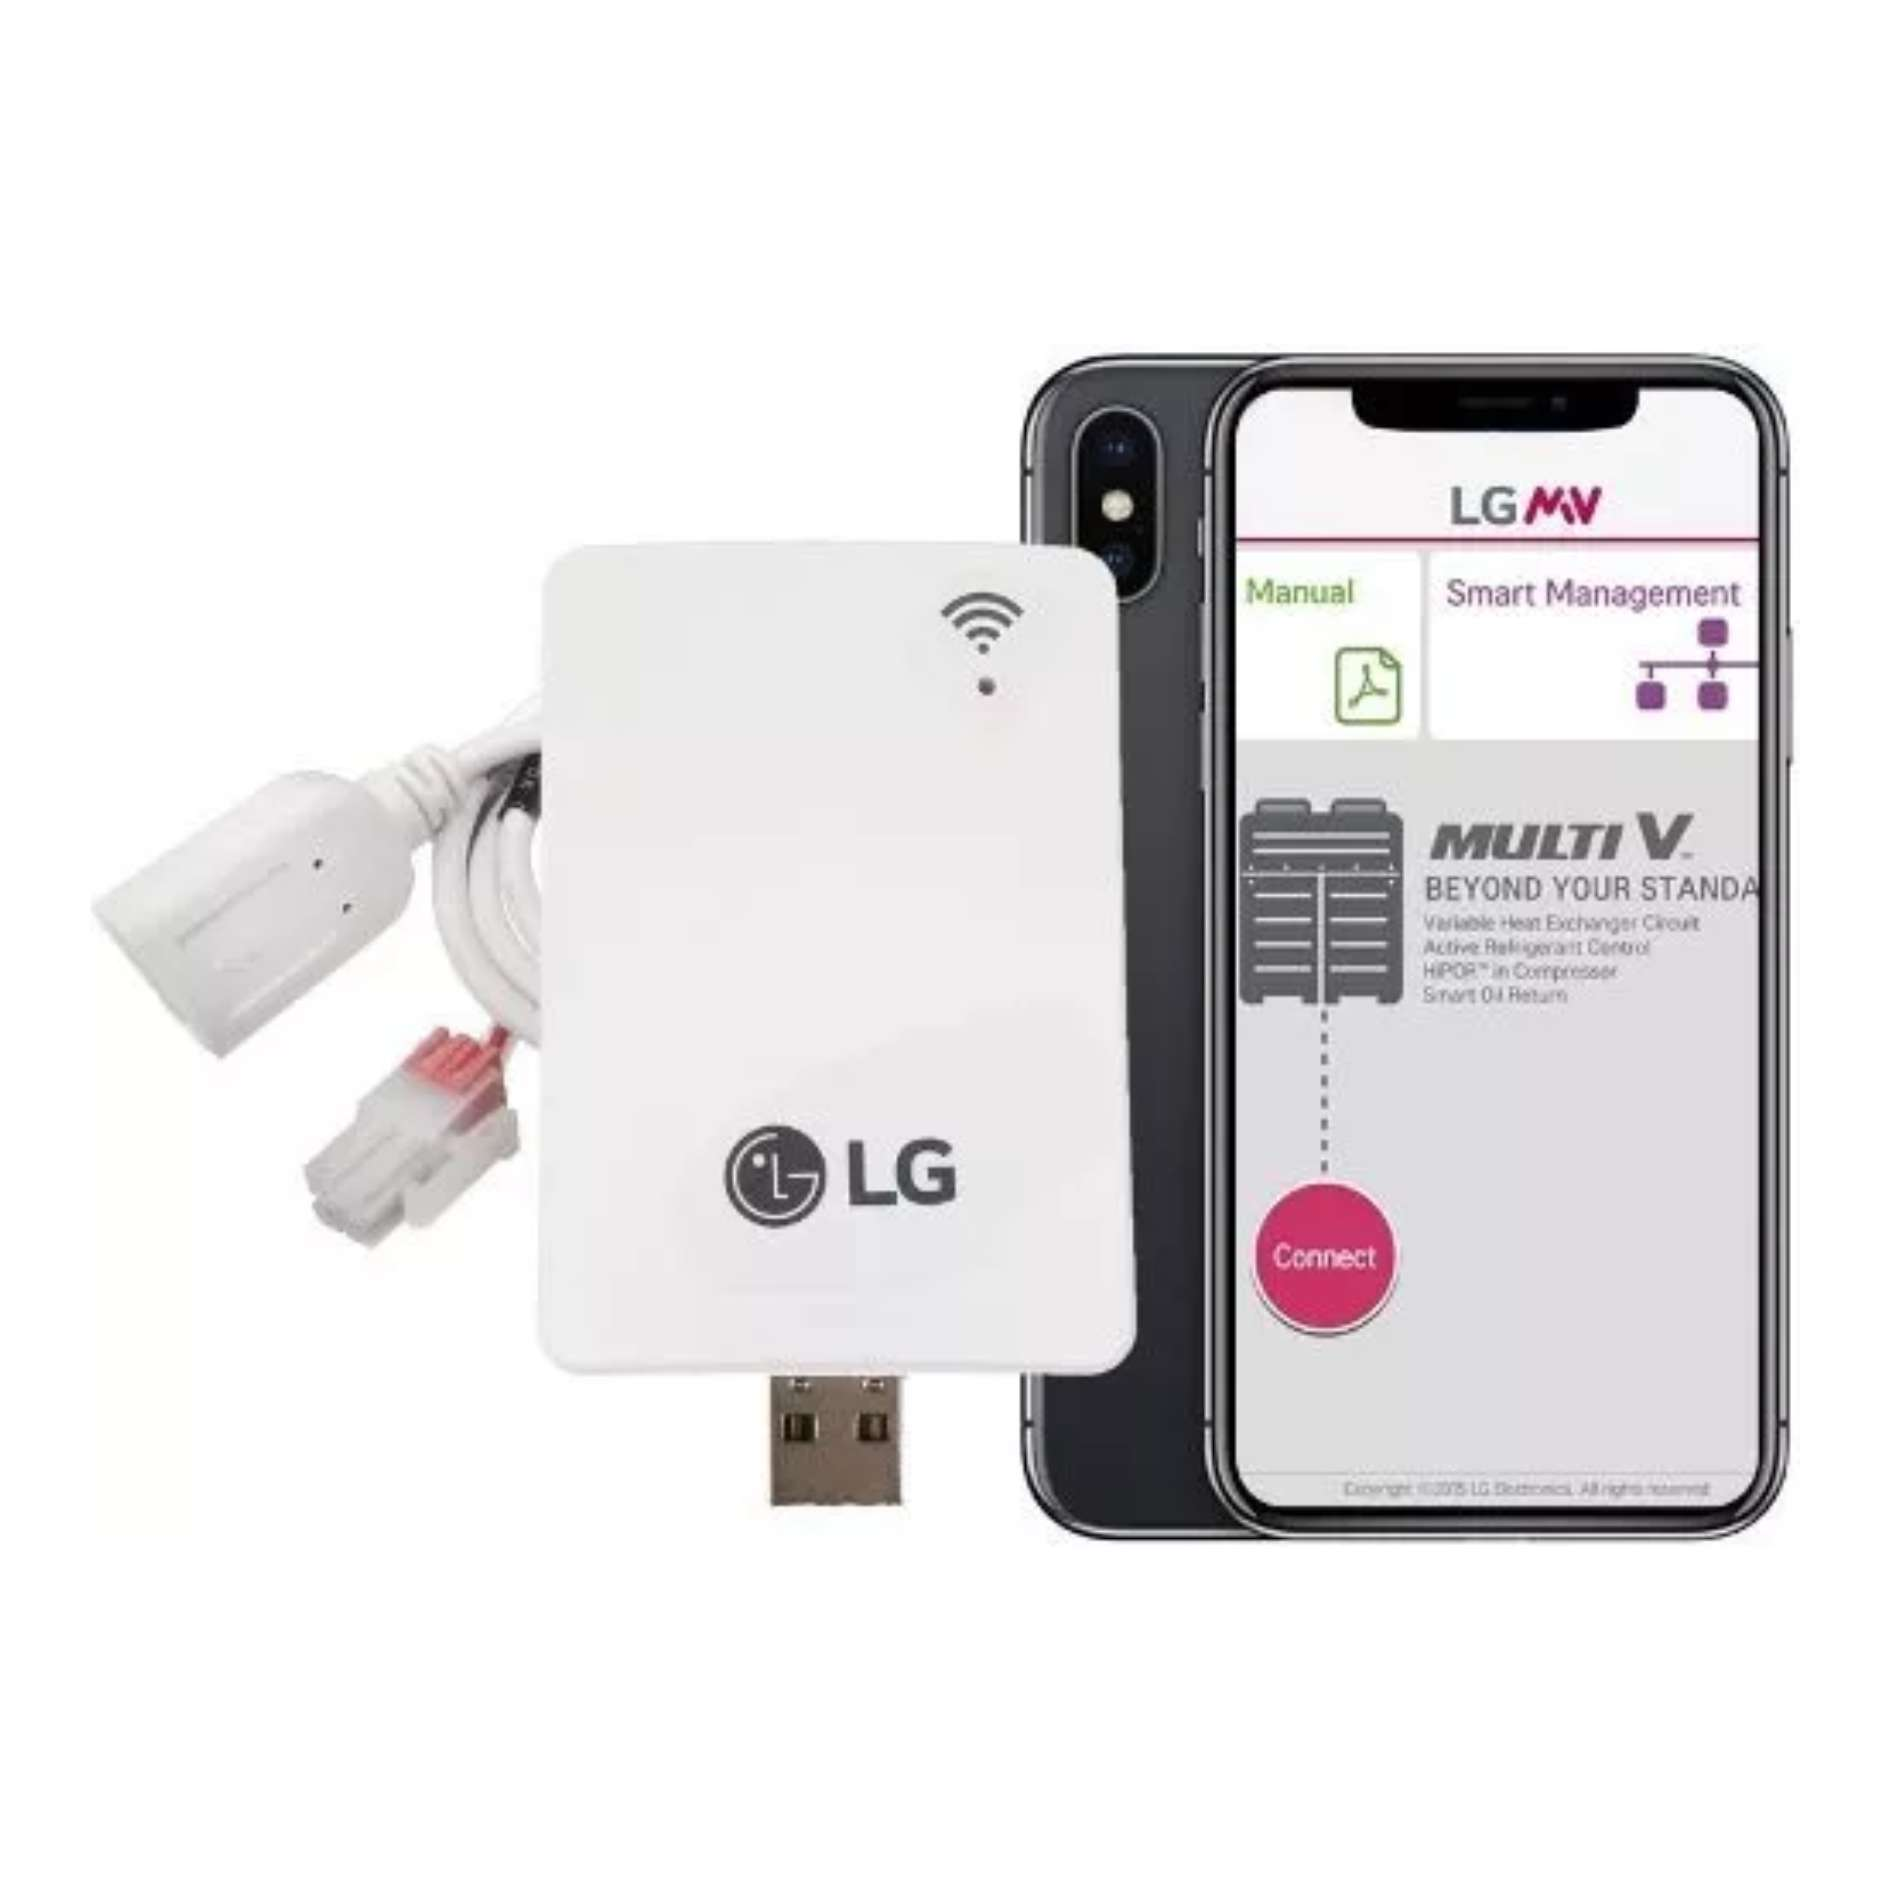 Teste Inverter Monitoramento LG Sims 2.0 Mobile LGMV Ar Condicionado